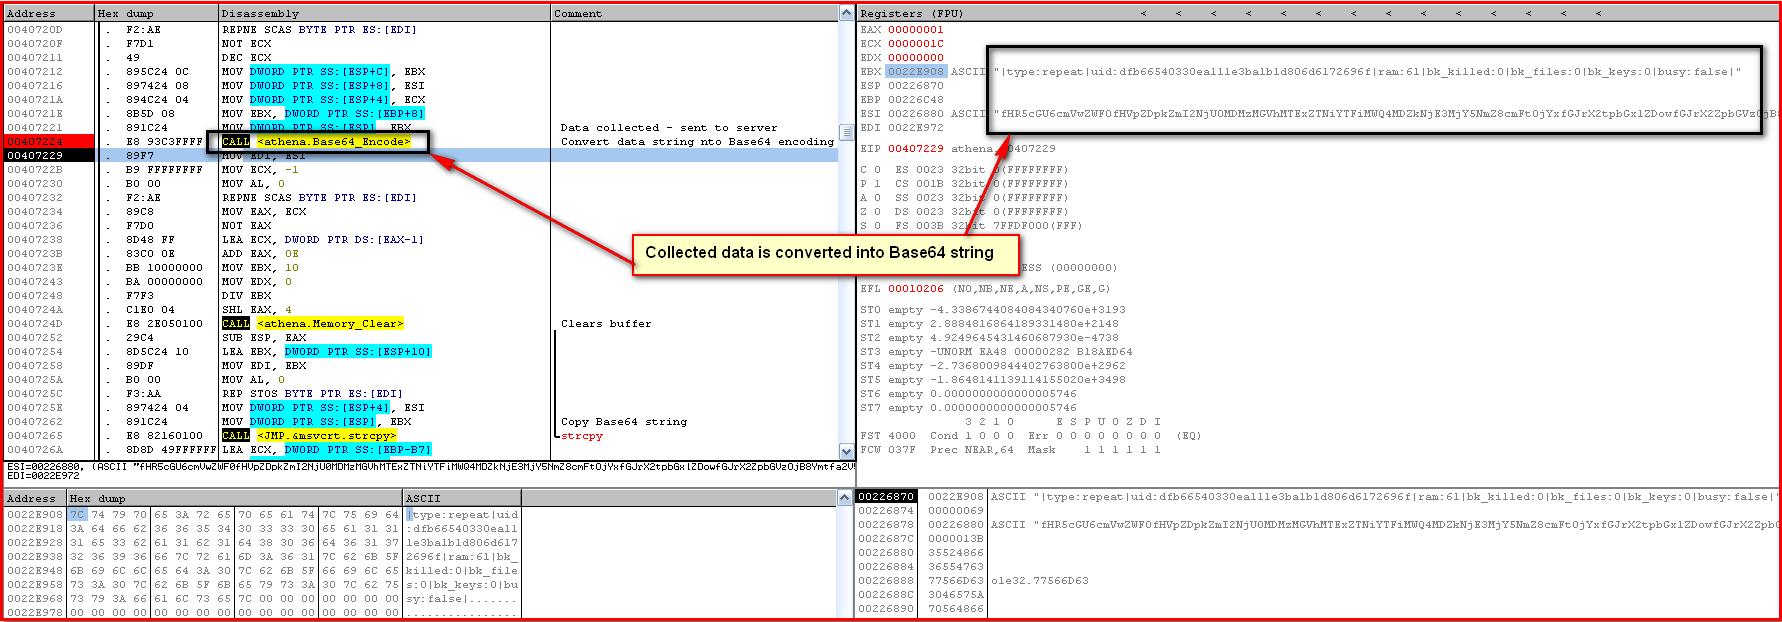 athena_data_convert_base64